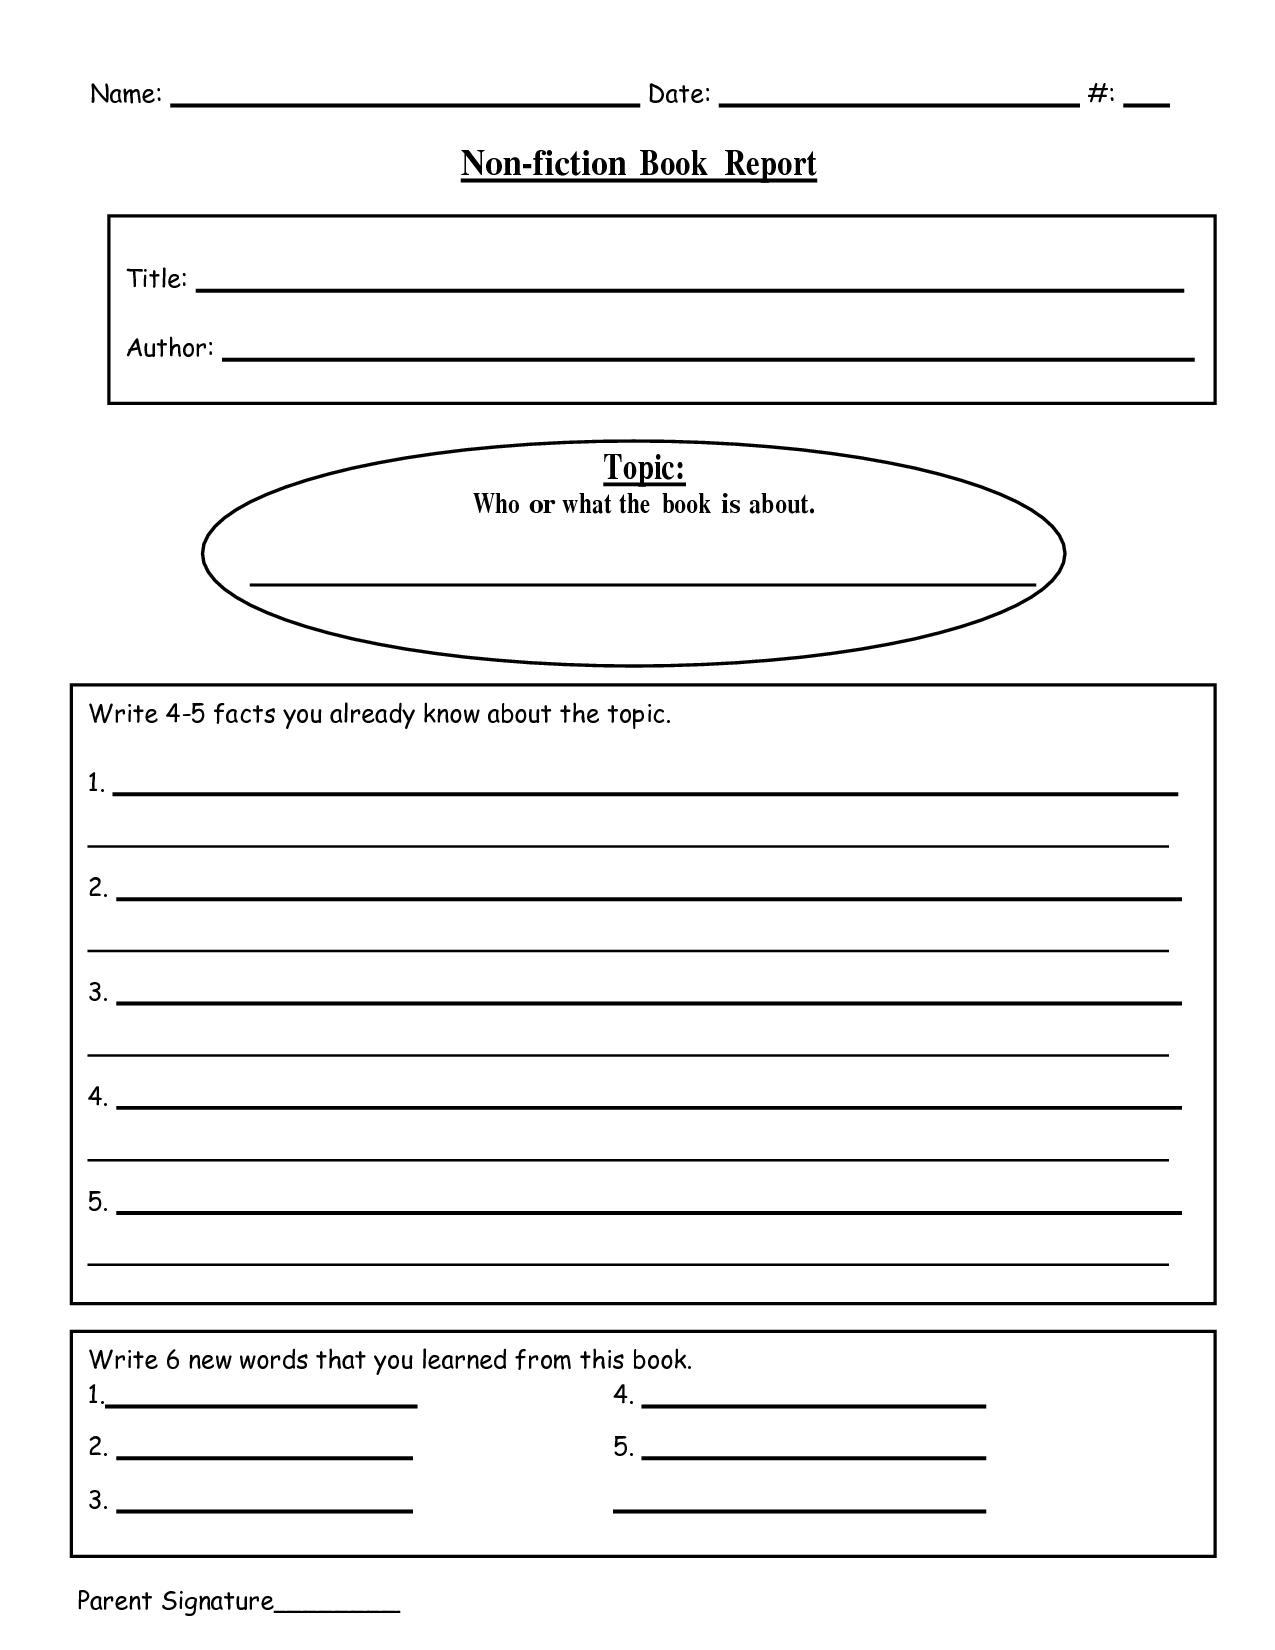 Free Printable Book Report Templates | Non-Fiction Book Report.doc - Free Printable Books For 5Th Graders